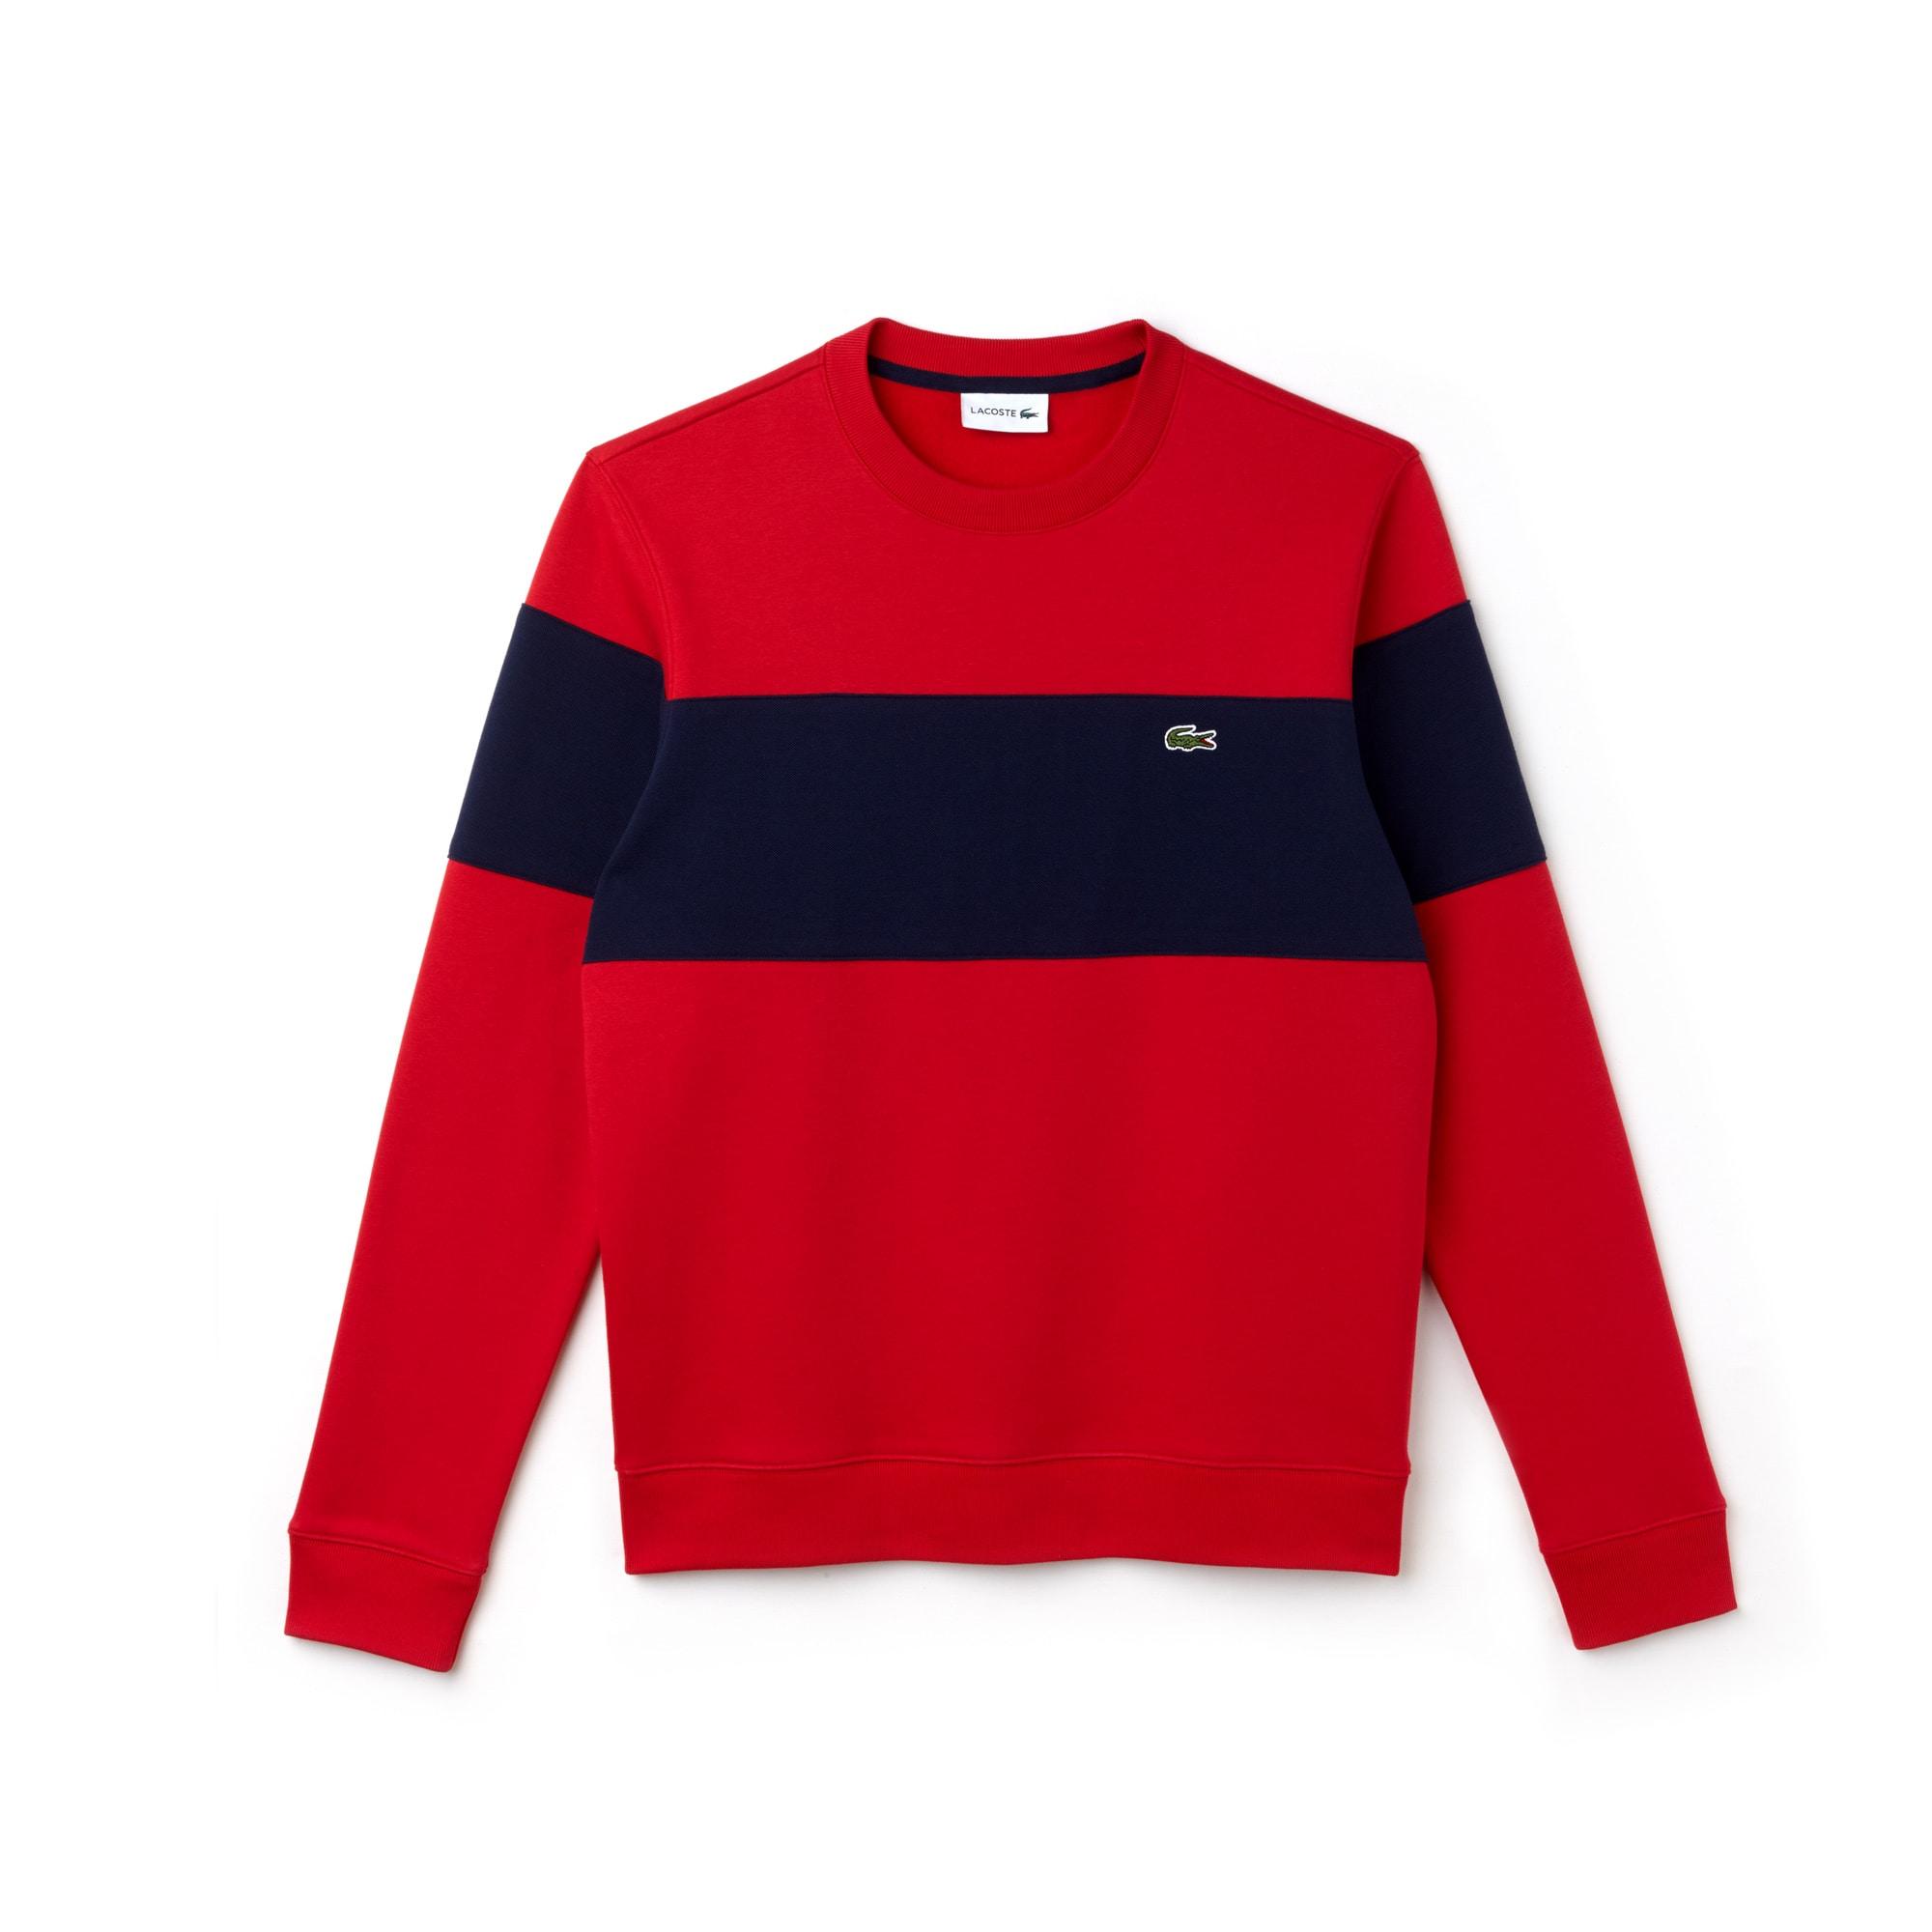 Herren Rundhals-Sweatshirt aus Baumwollfleece mit Colorblocks